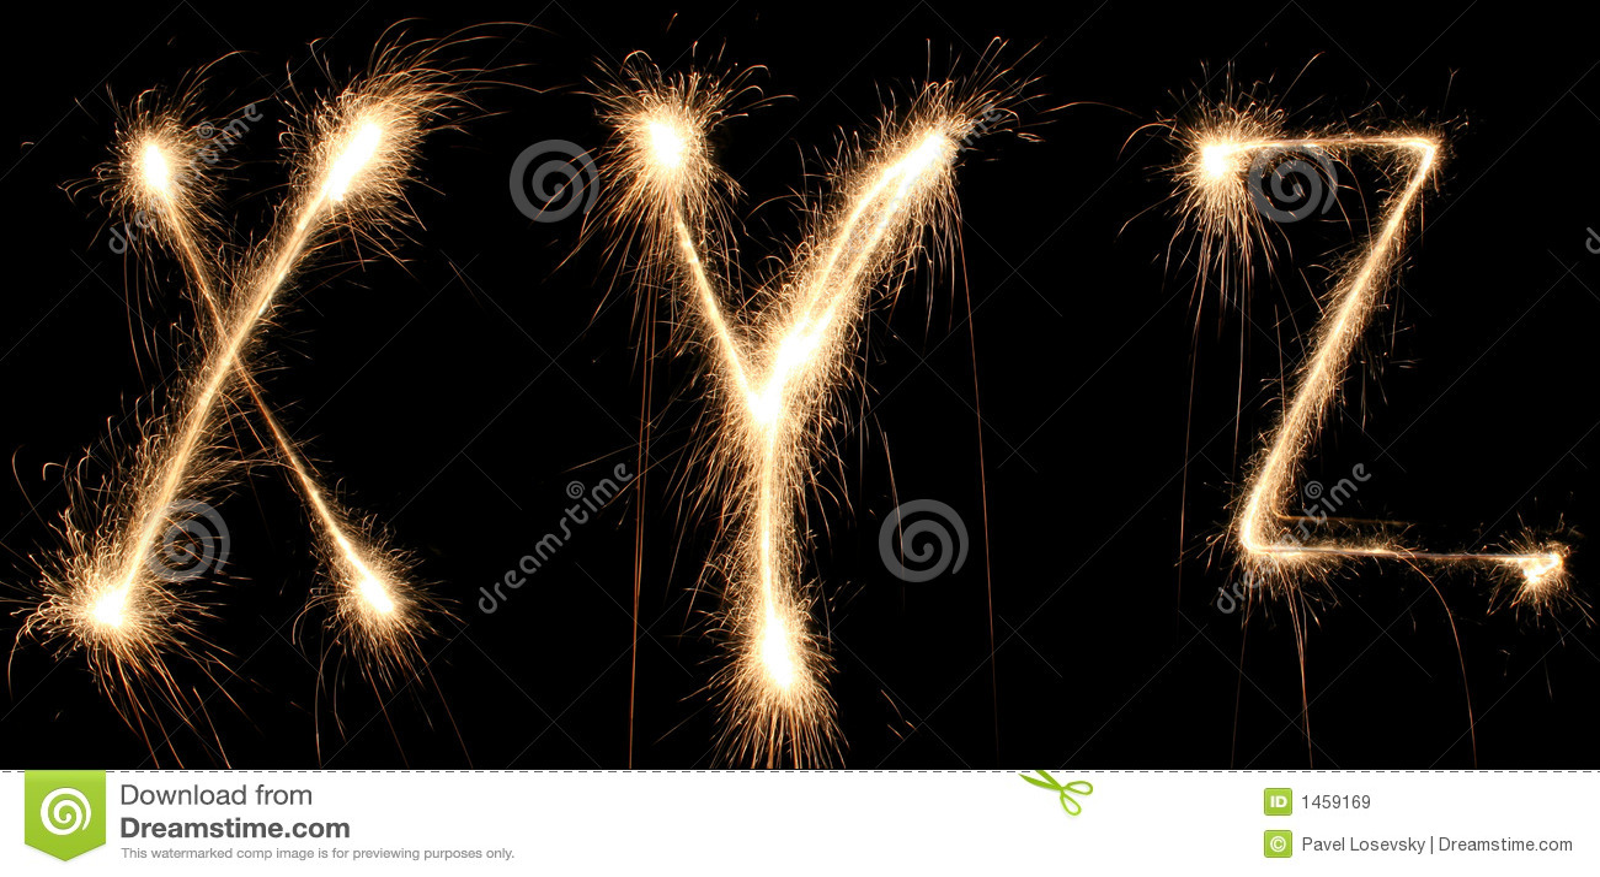 Alphabet Sparkler Royalty Free Stock Images